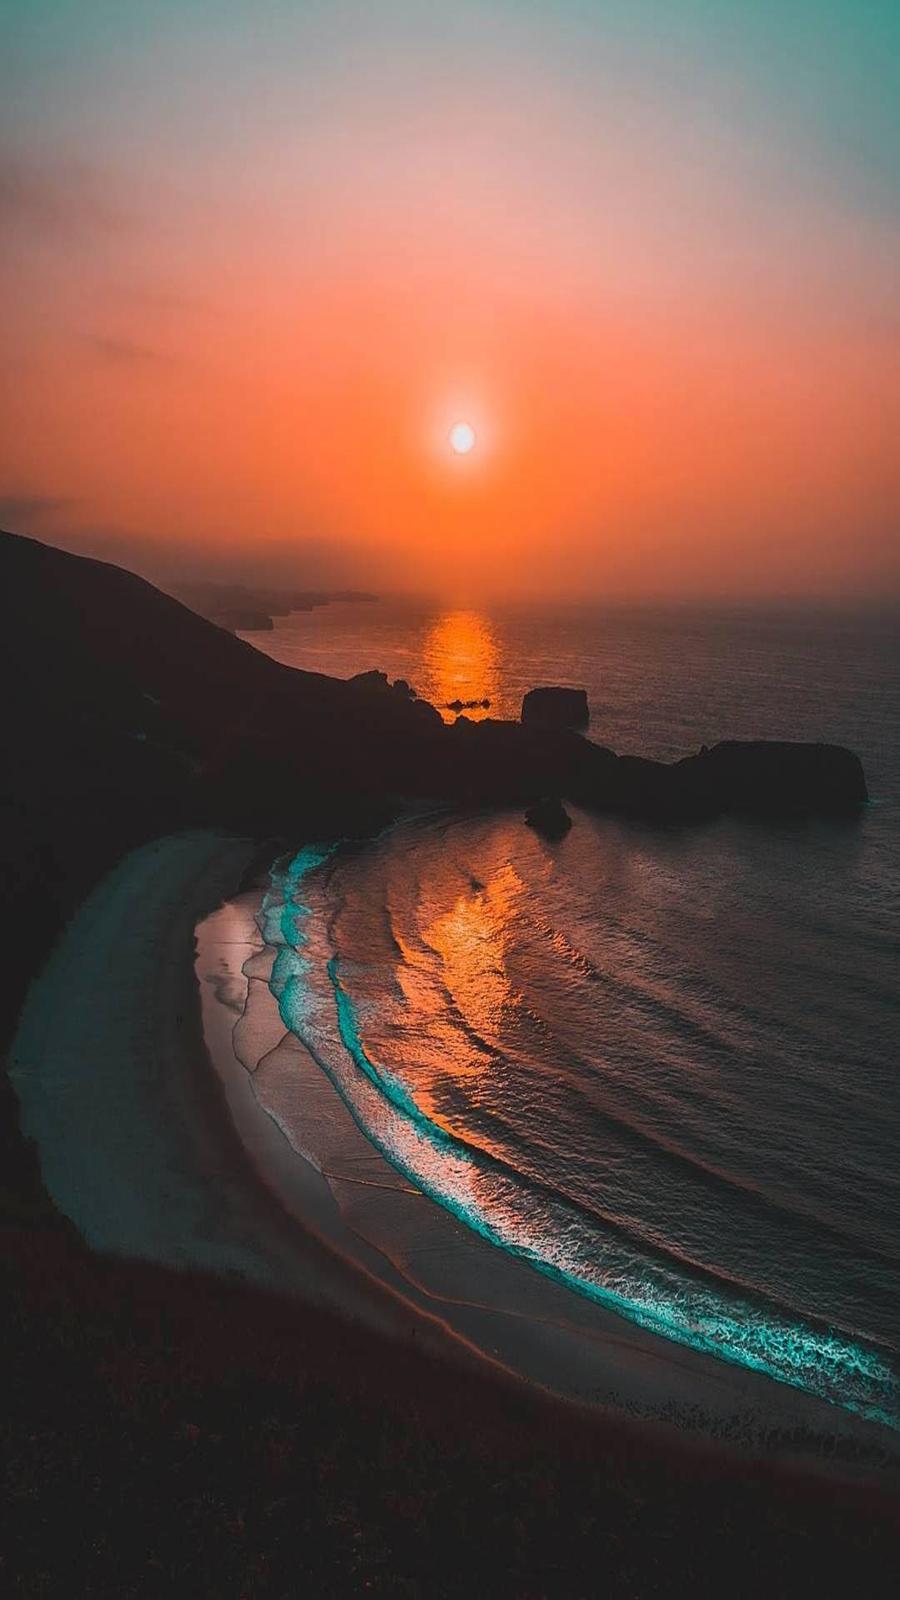 Sunset Sea 4K HD Wallpapers Free Download for Phone & Desktop